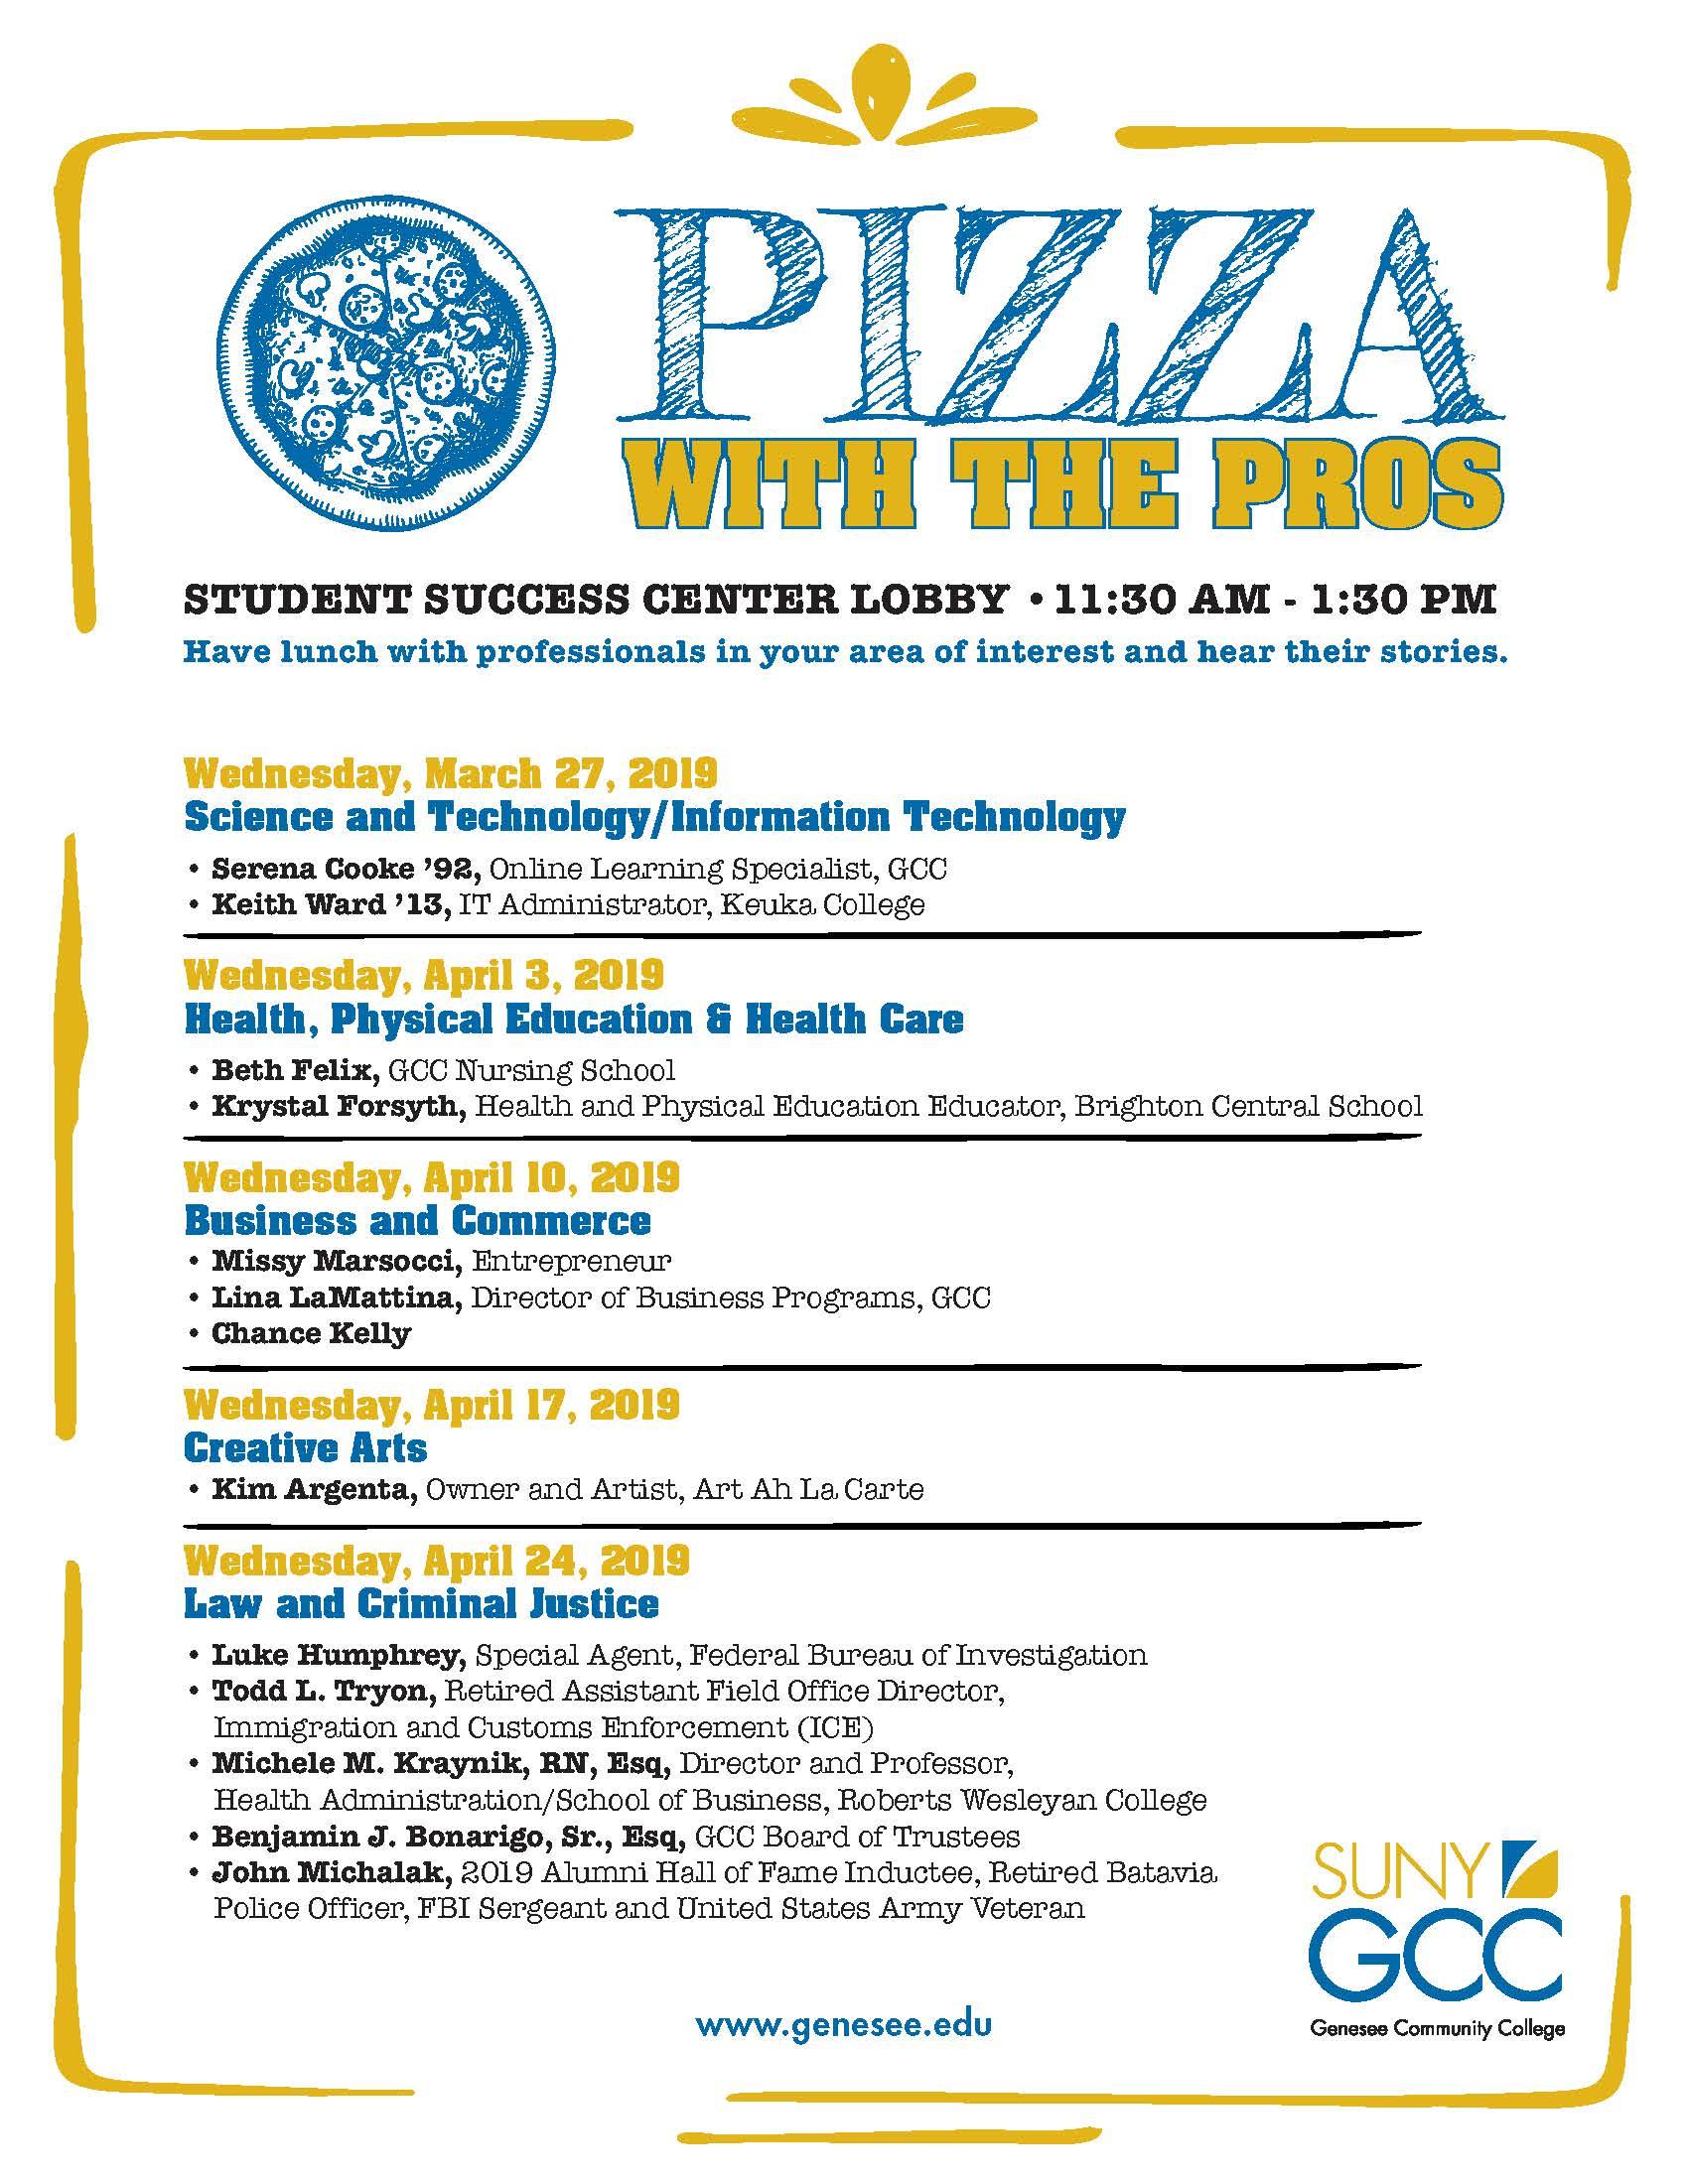 Student Success Center events flyer